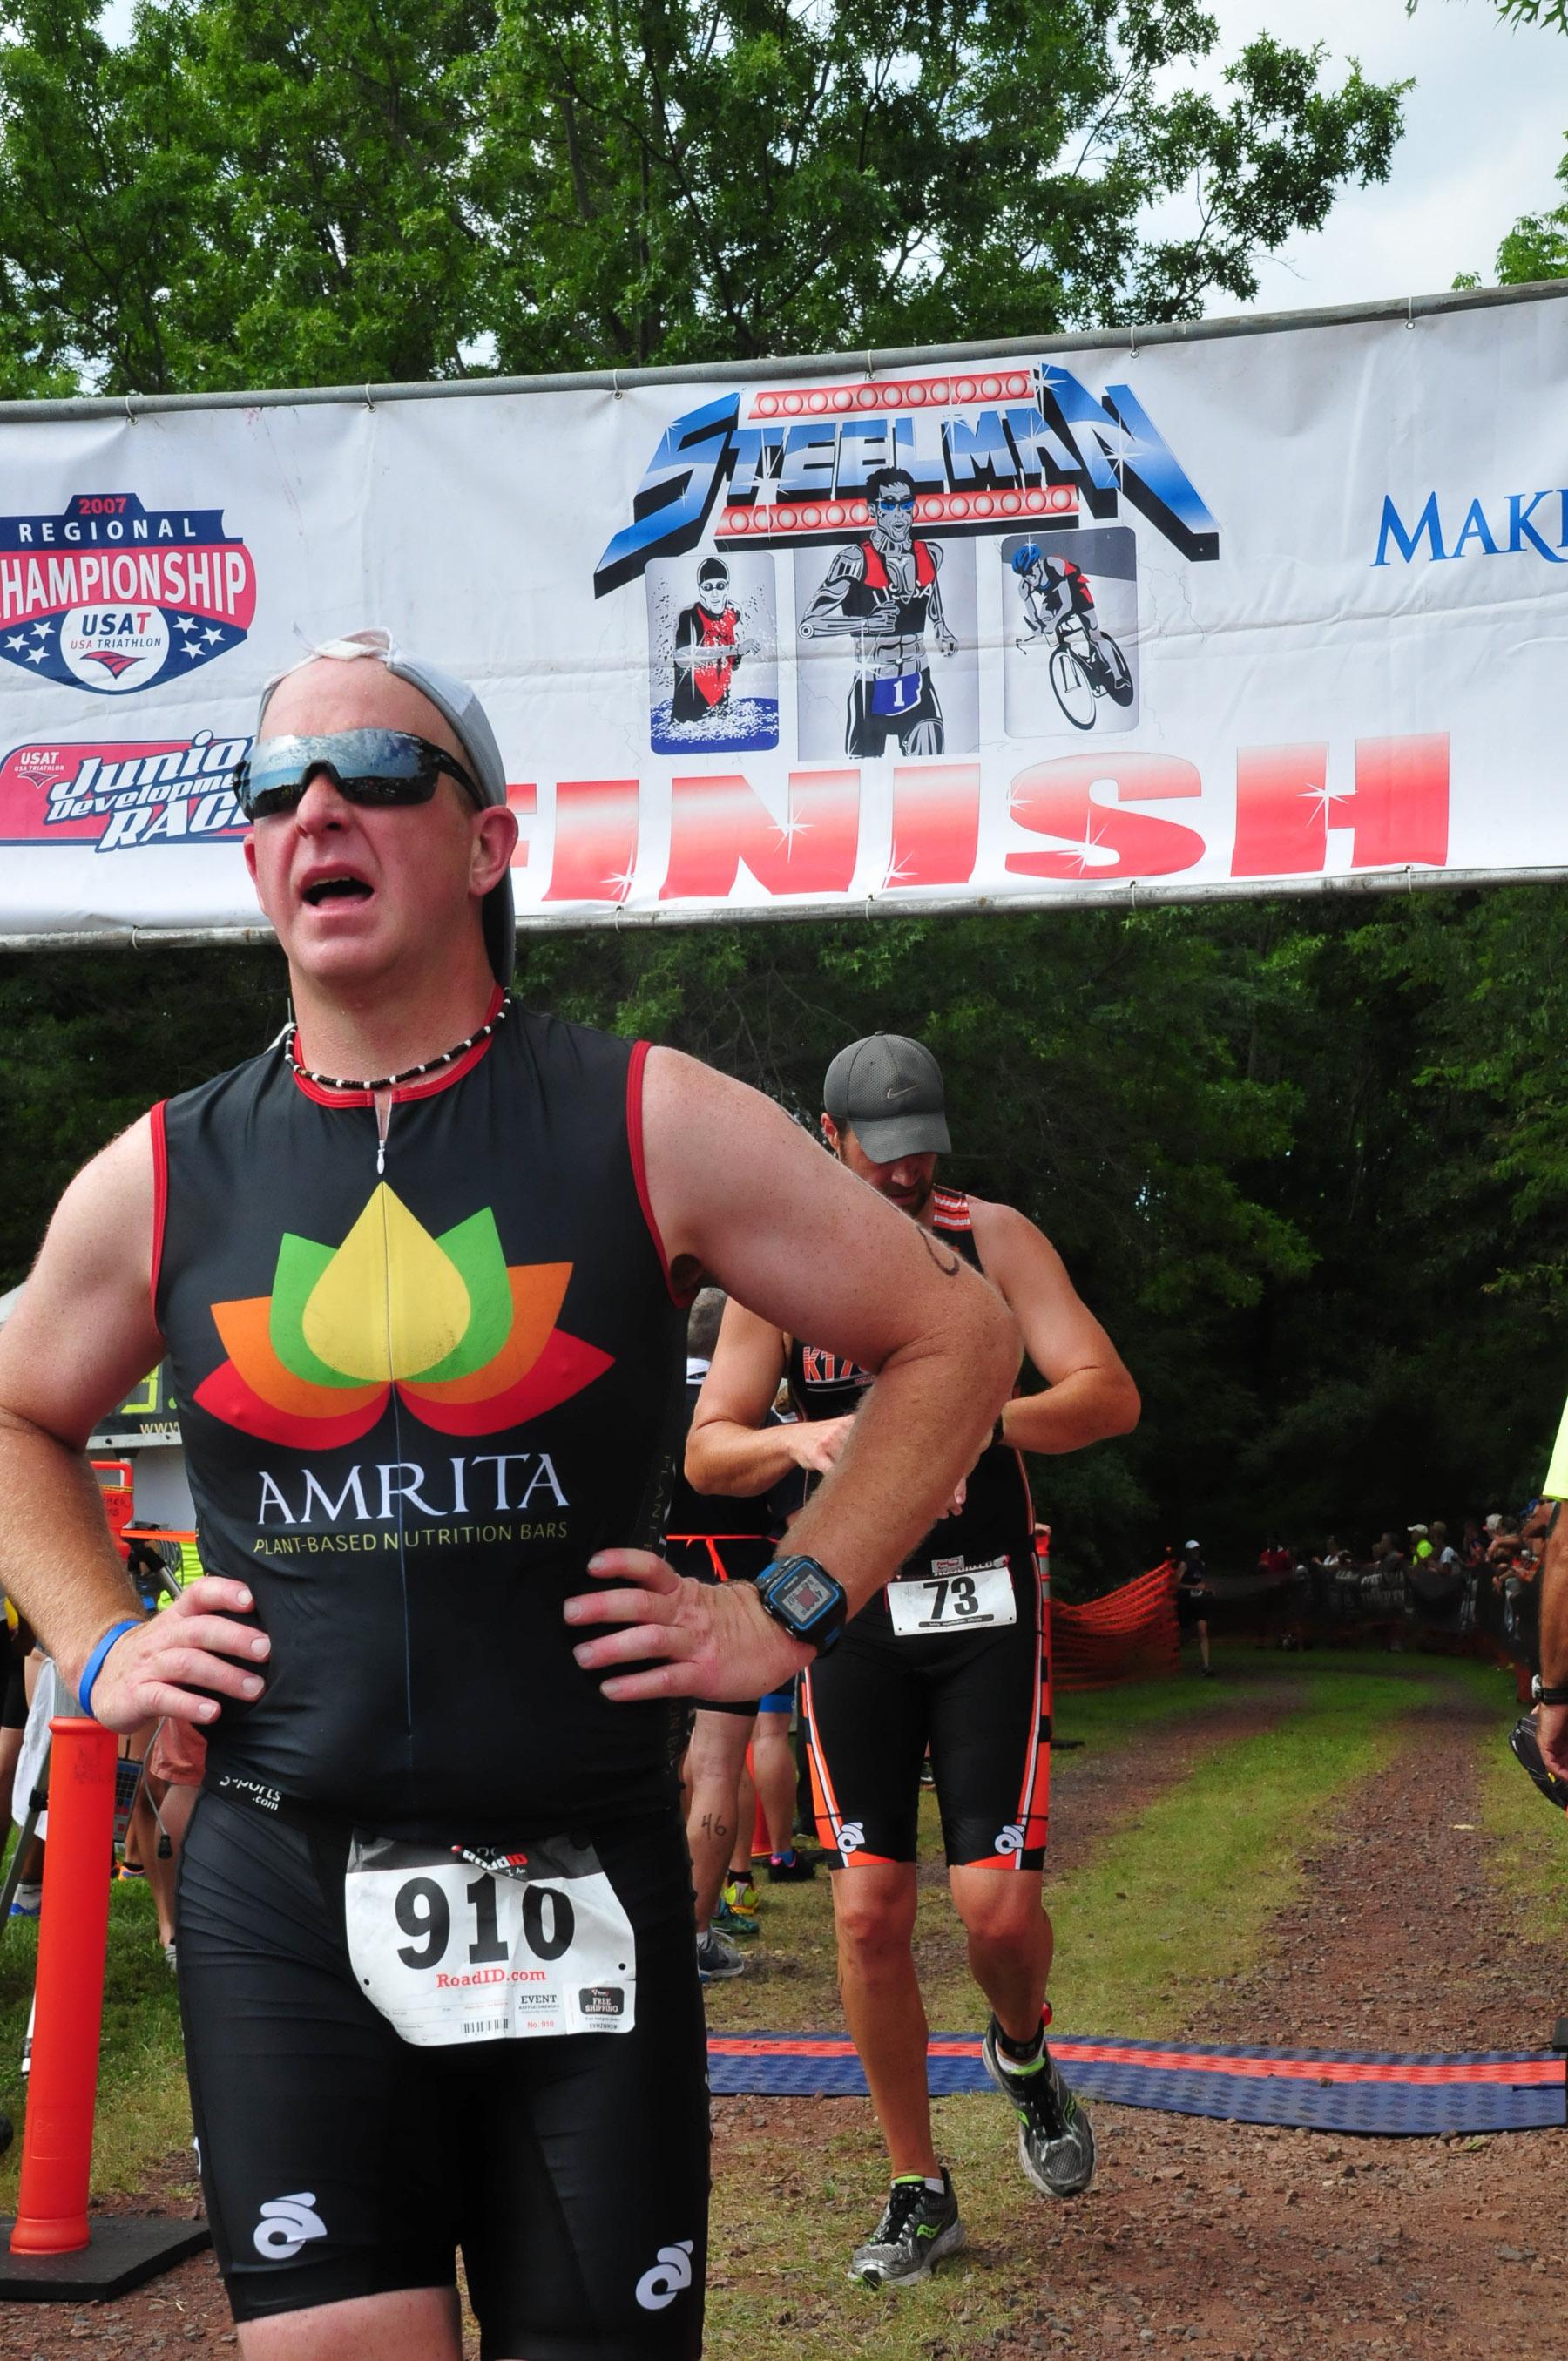 Endurance Sports, International, Me, Olympic, Race, Sports, Triathlon, event, multisport, tri